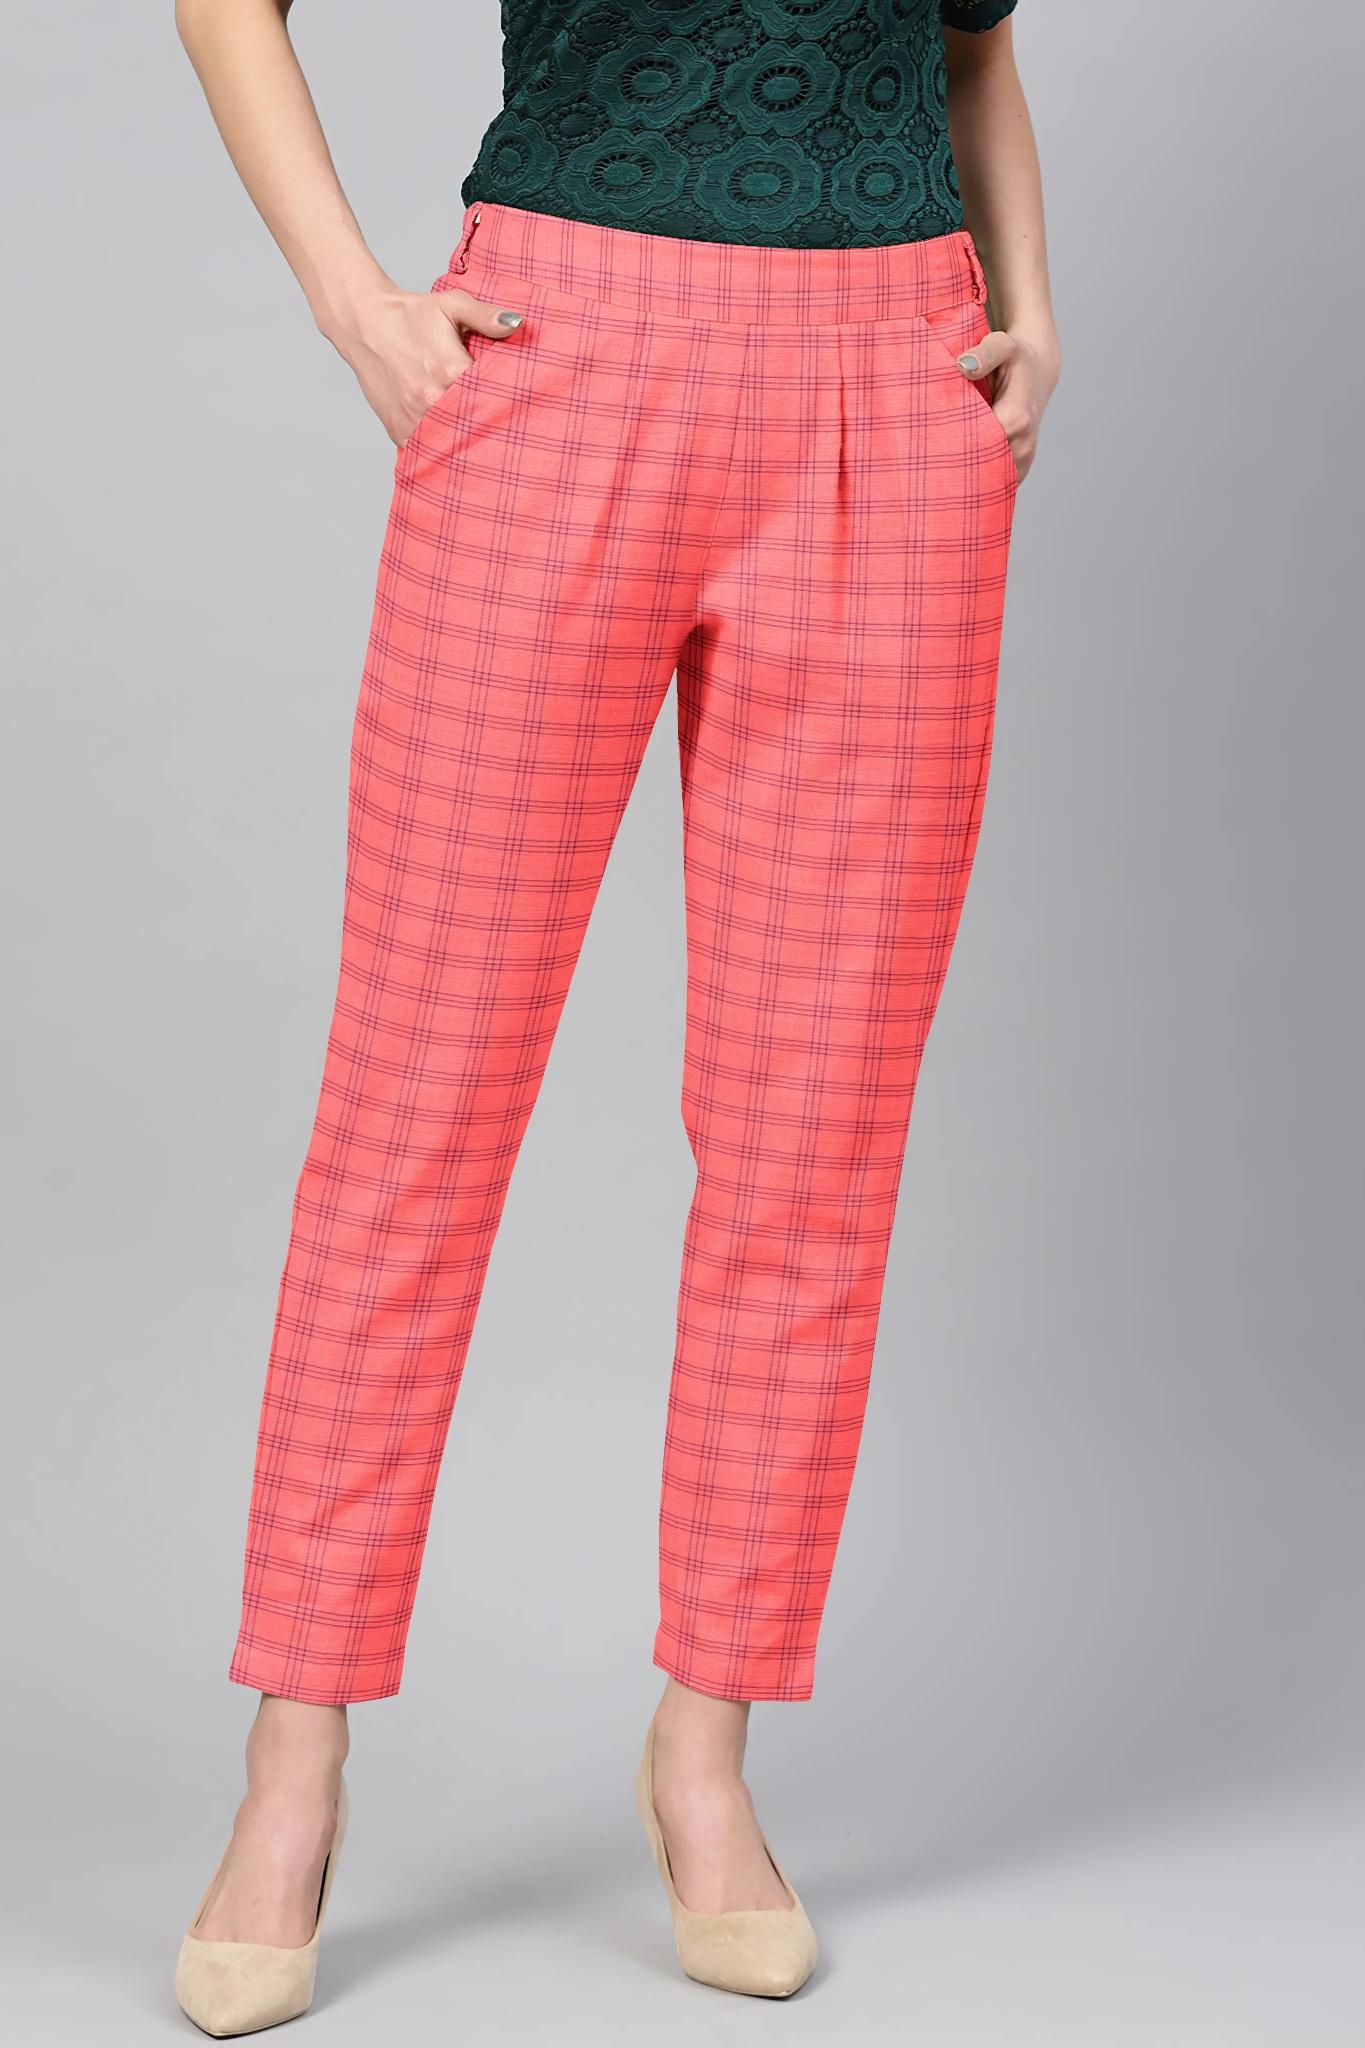 /home/customer/www/fabartcraft.com/public_html/uploadshttps://www.shopolics.com/uploads/images/medium/Pink-Blue-Cotton-Check-Regular-Fit-Solid-Trouser-36100.jpg